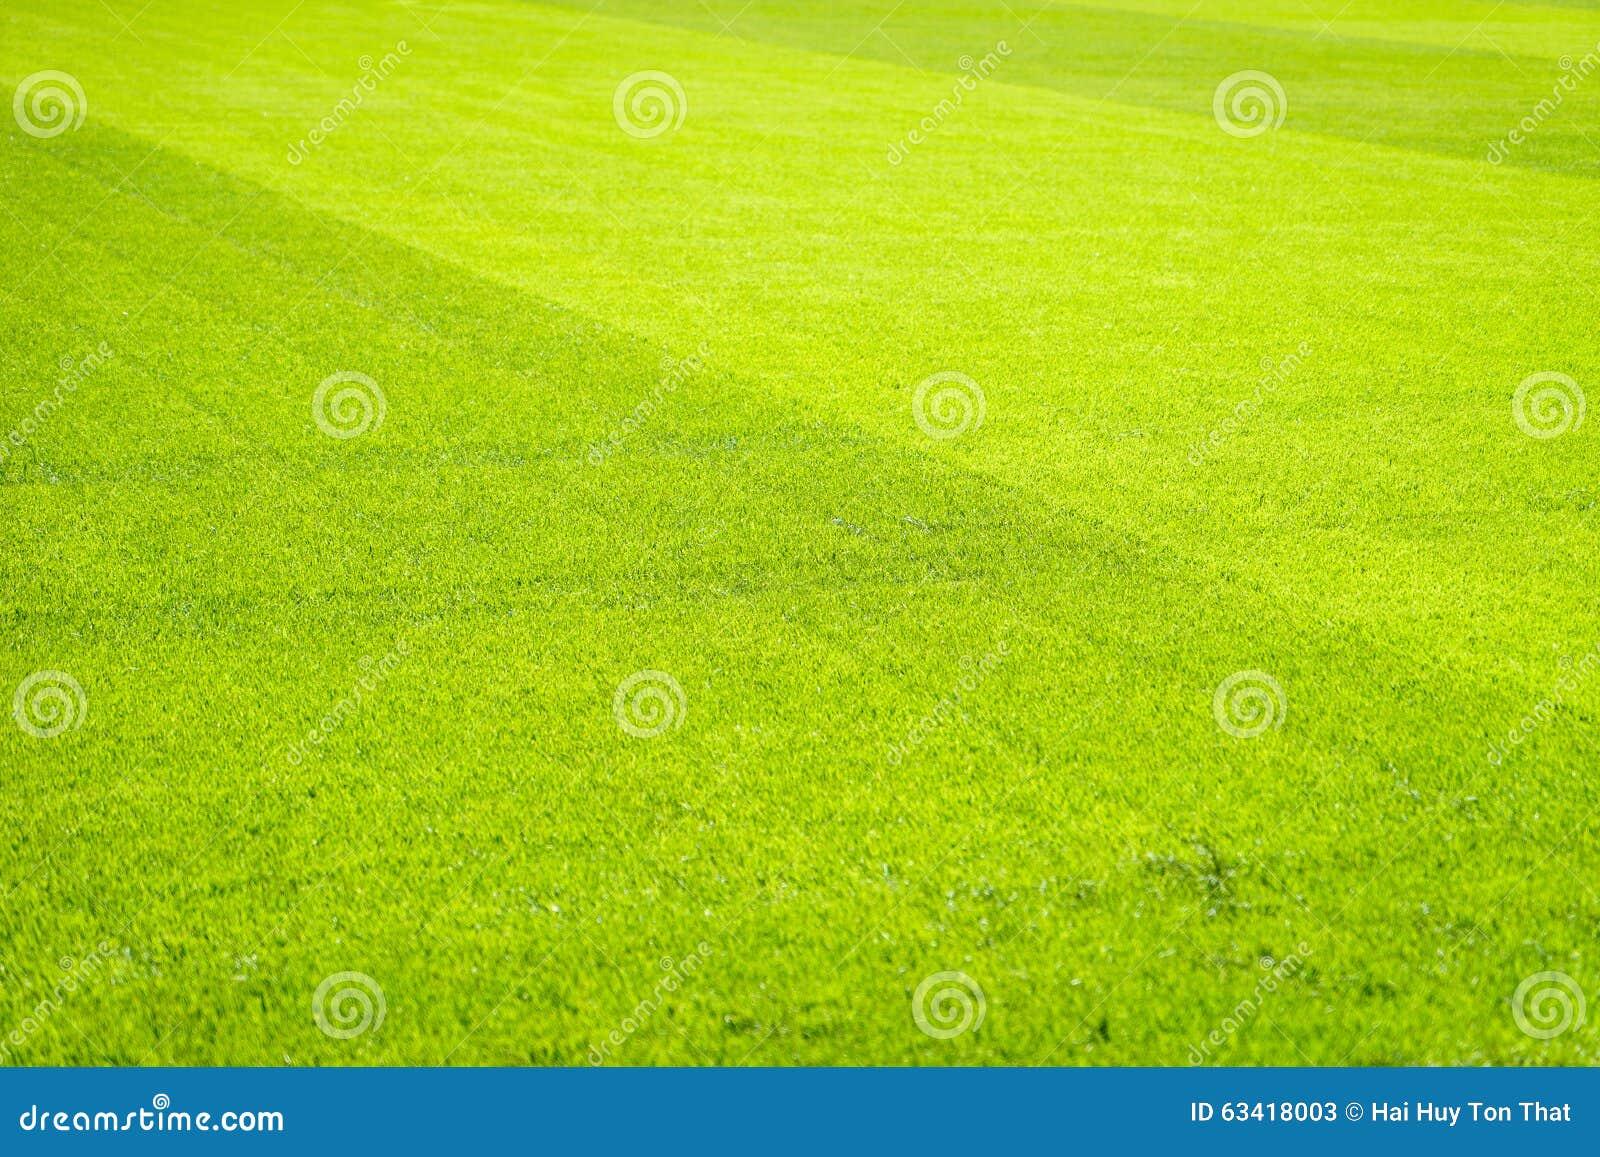 green grass field background texture pattern stock image